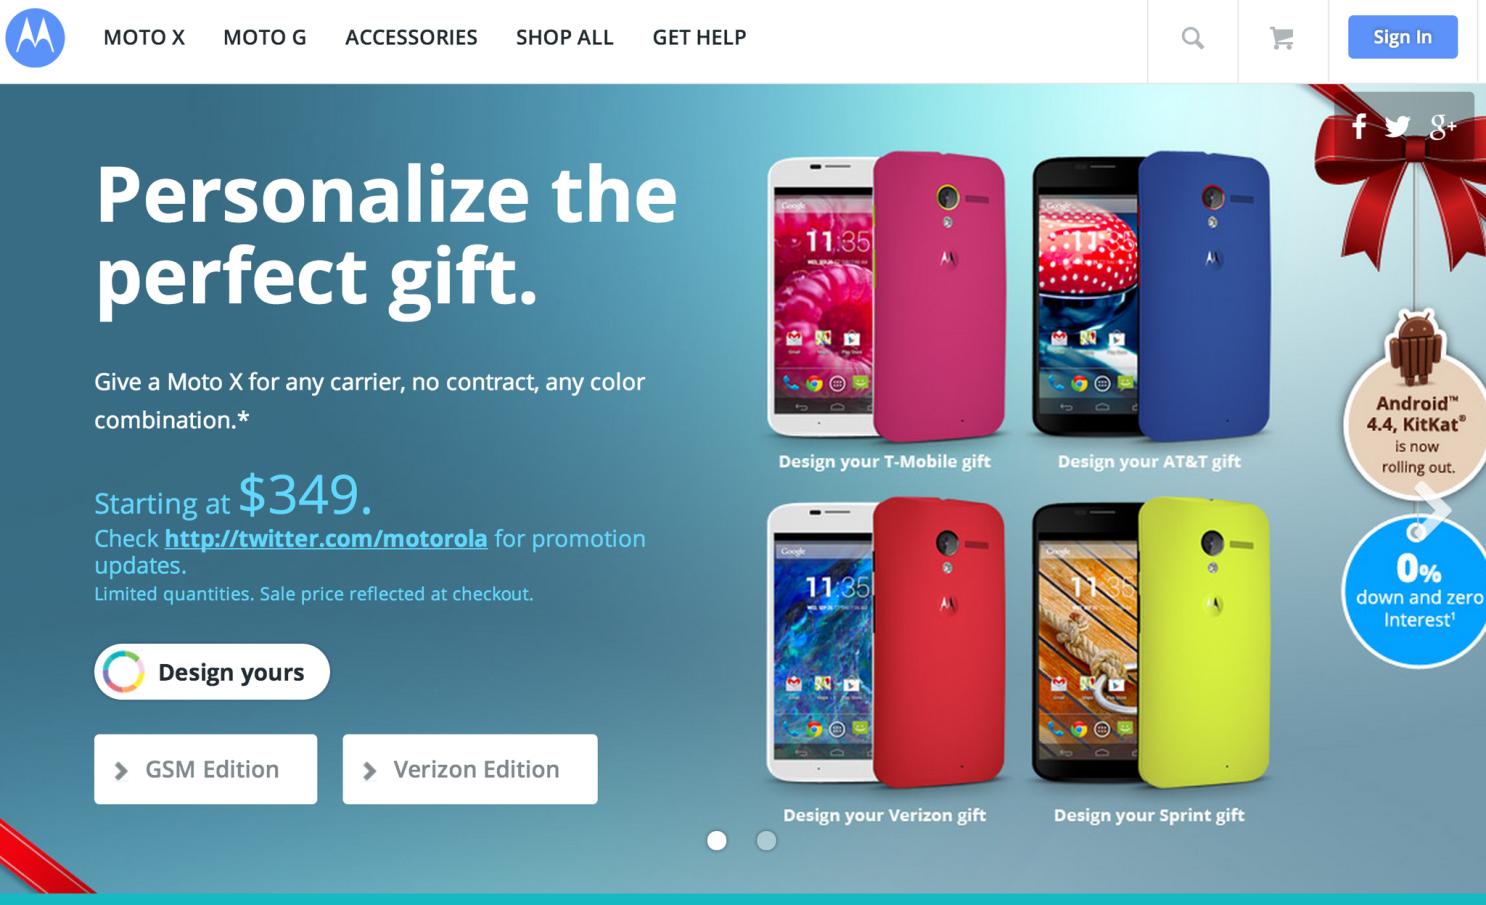 Motorola Site Crashes Amid Demand Moto X Cyber Monday Deal Postponed Los Angeles Times